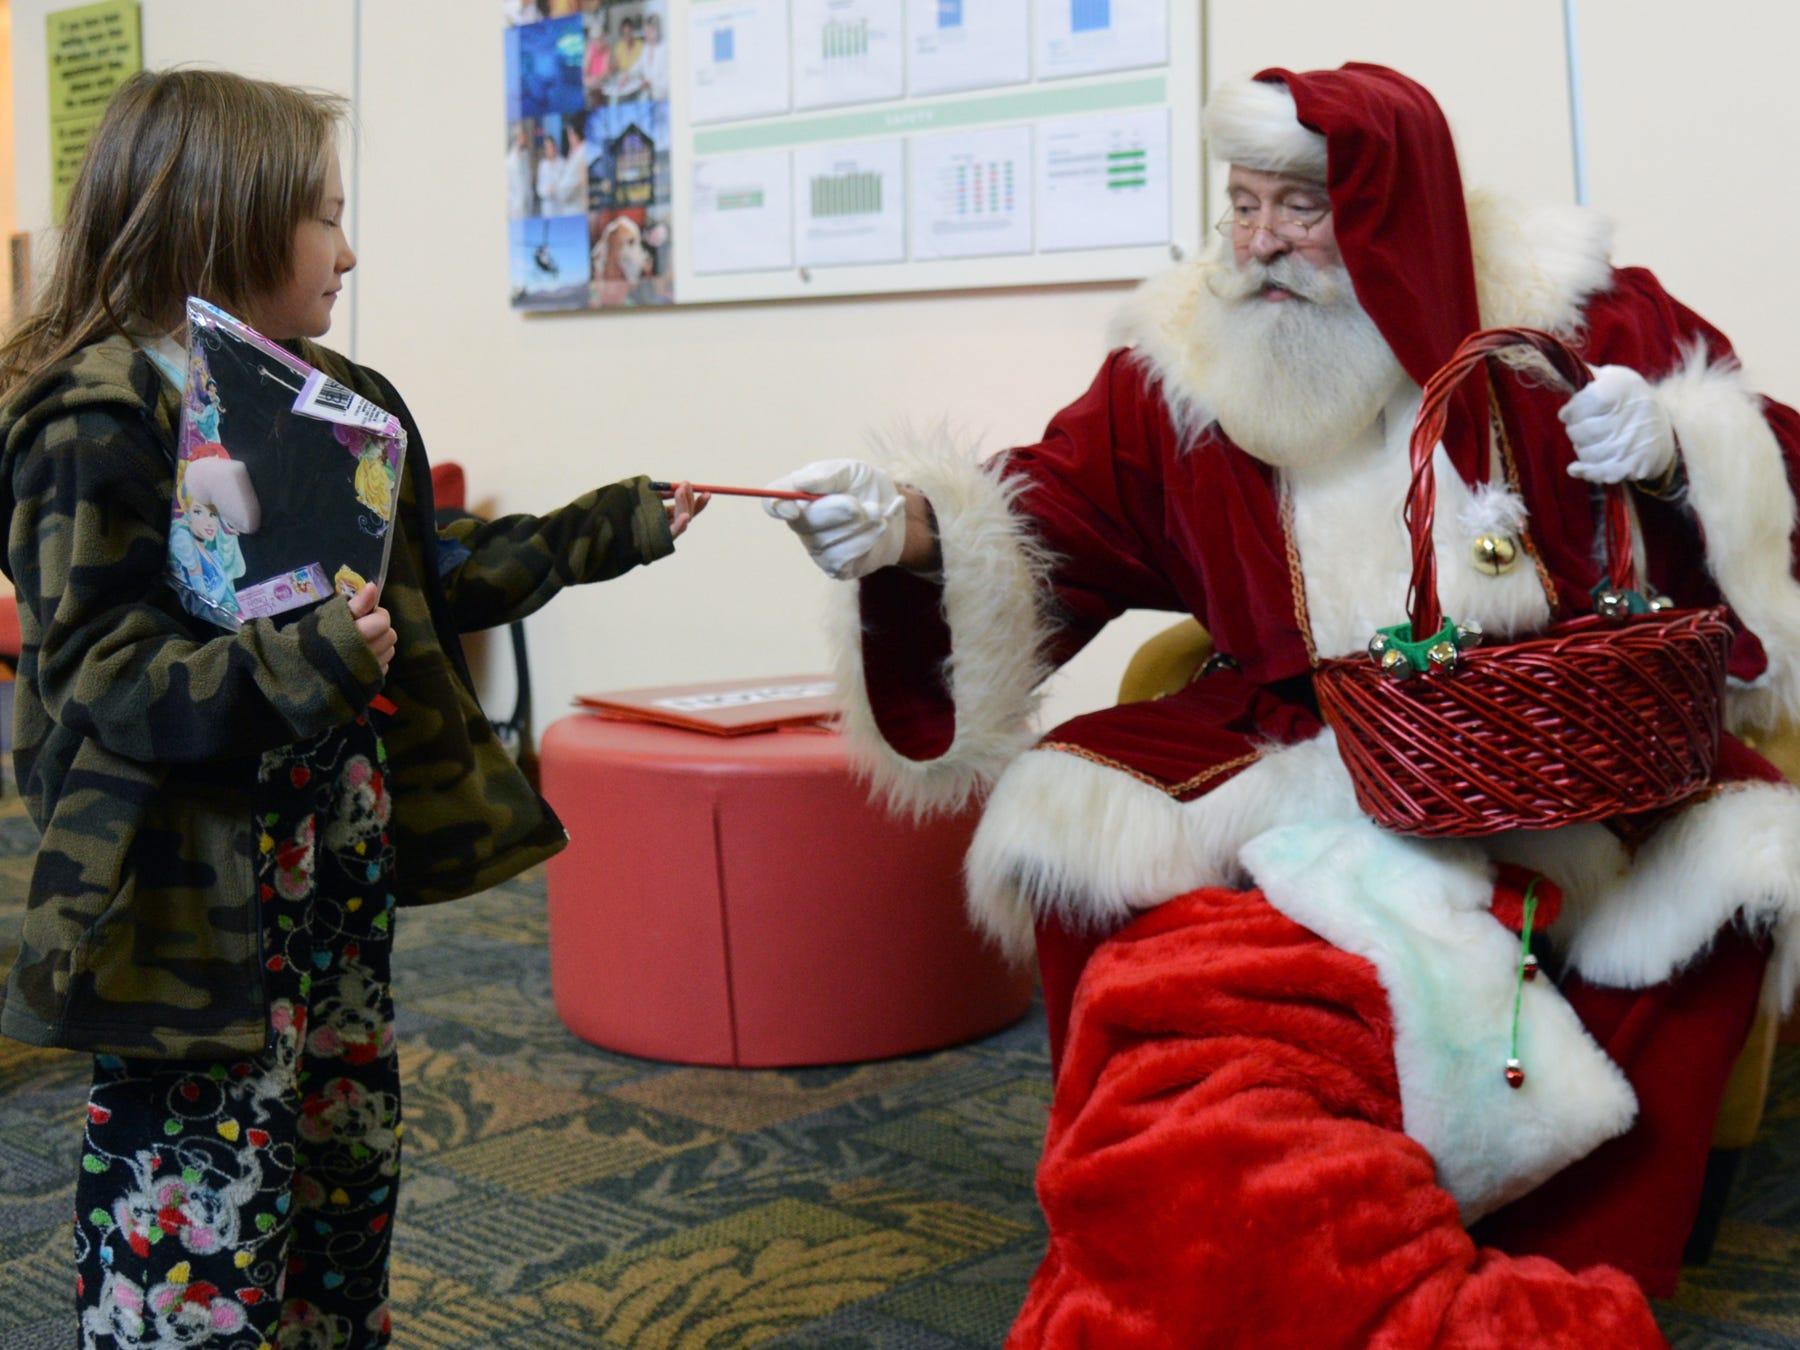 Shalimar Daniels visits Santa Claus Thursday morning at Mission Children's Hospital in November 2013.